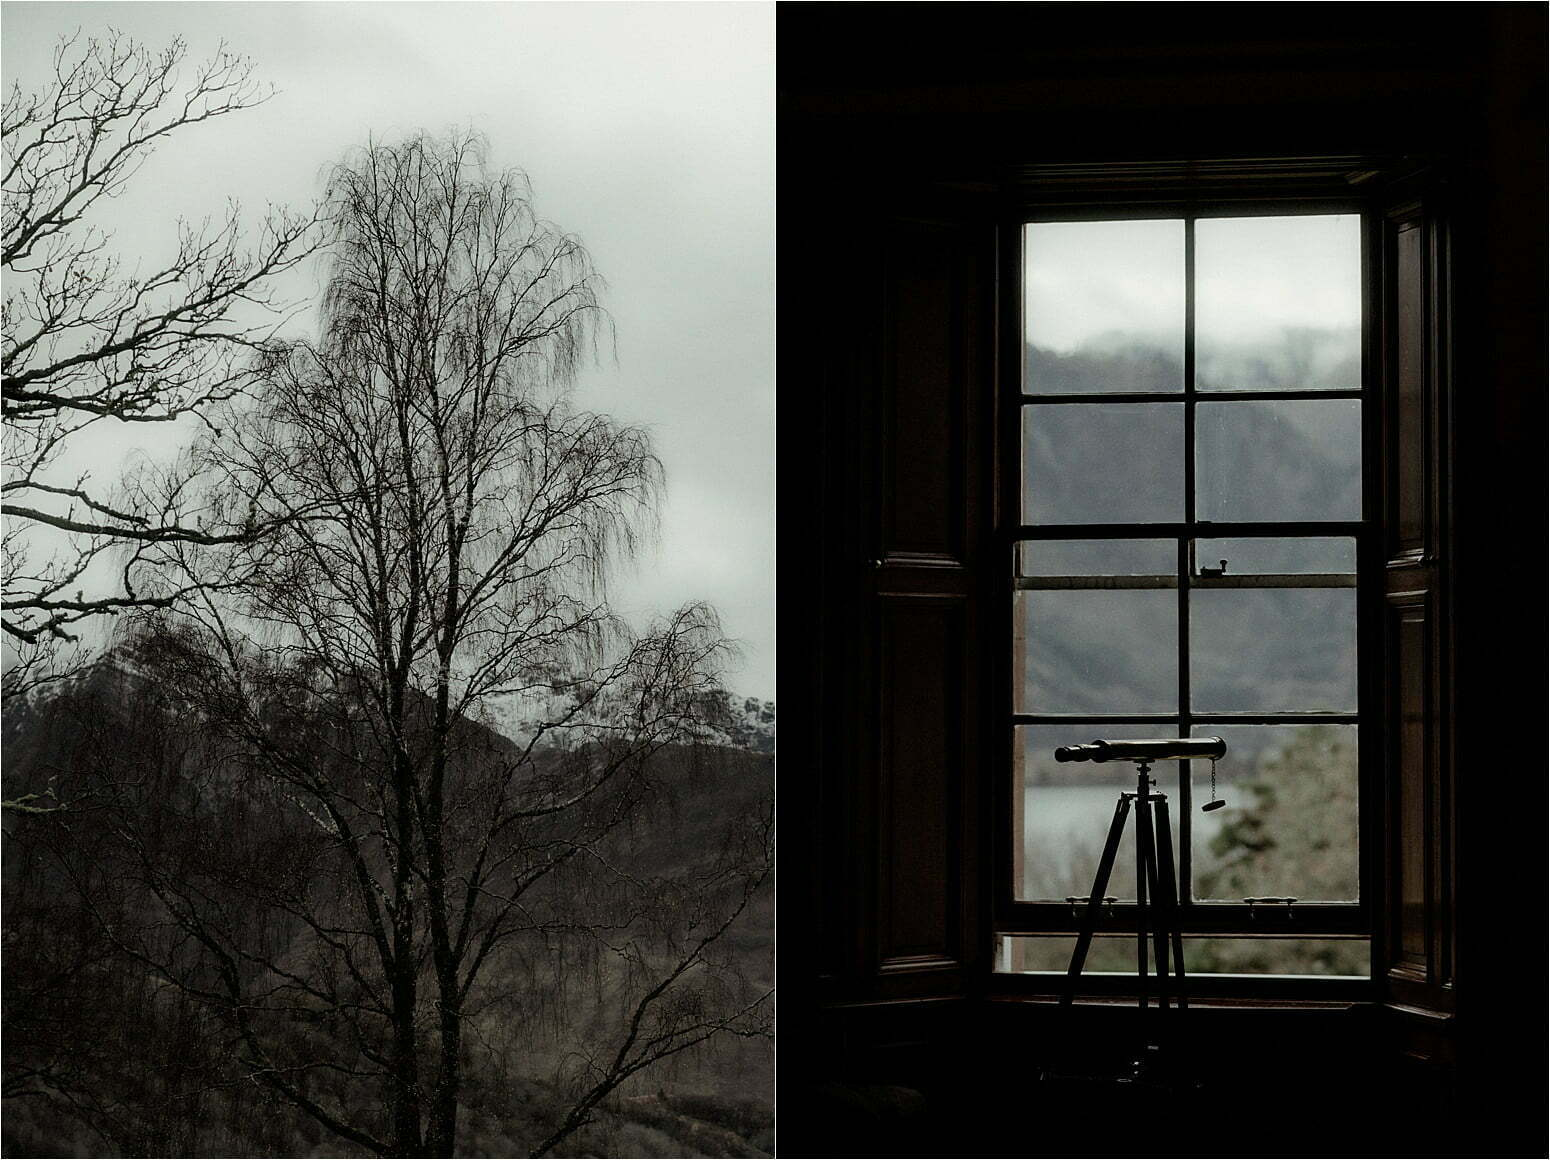 glencoe house view over loch leven